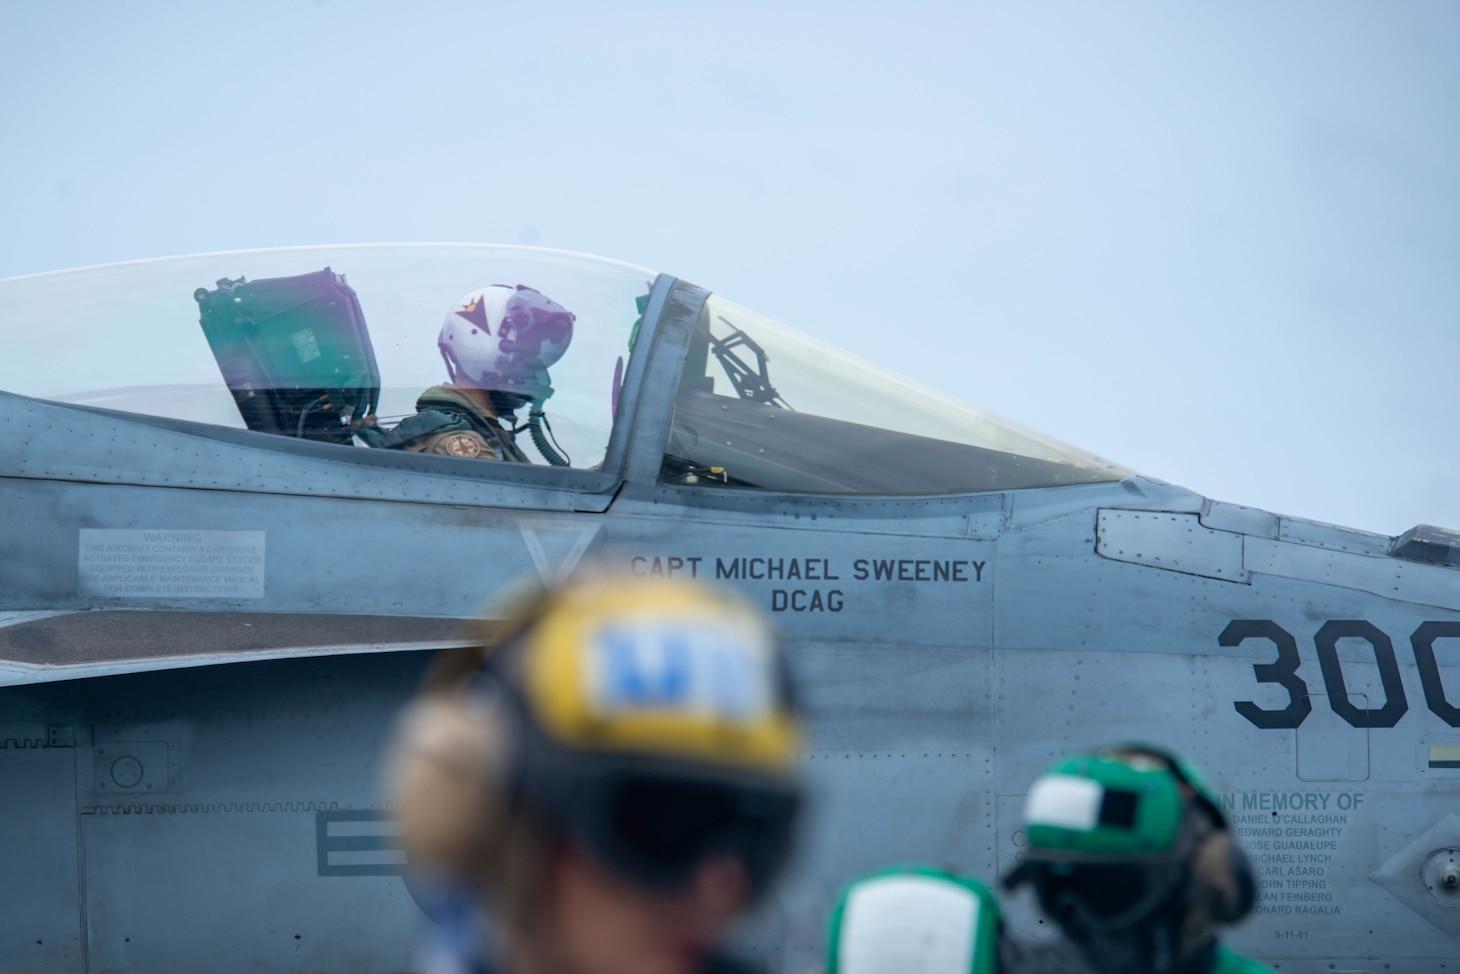 An F/A-18E Super Hornet prepares to launch from the flight deck of the U.S. Navy�s only forward-deployed aircraft carrier USS Ronald Reagan (CVN 76).